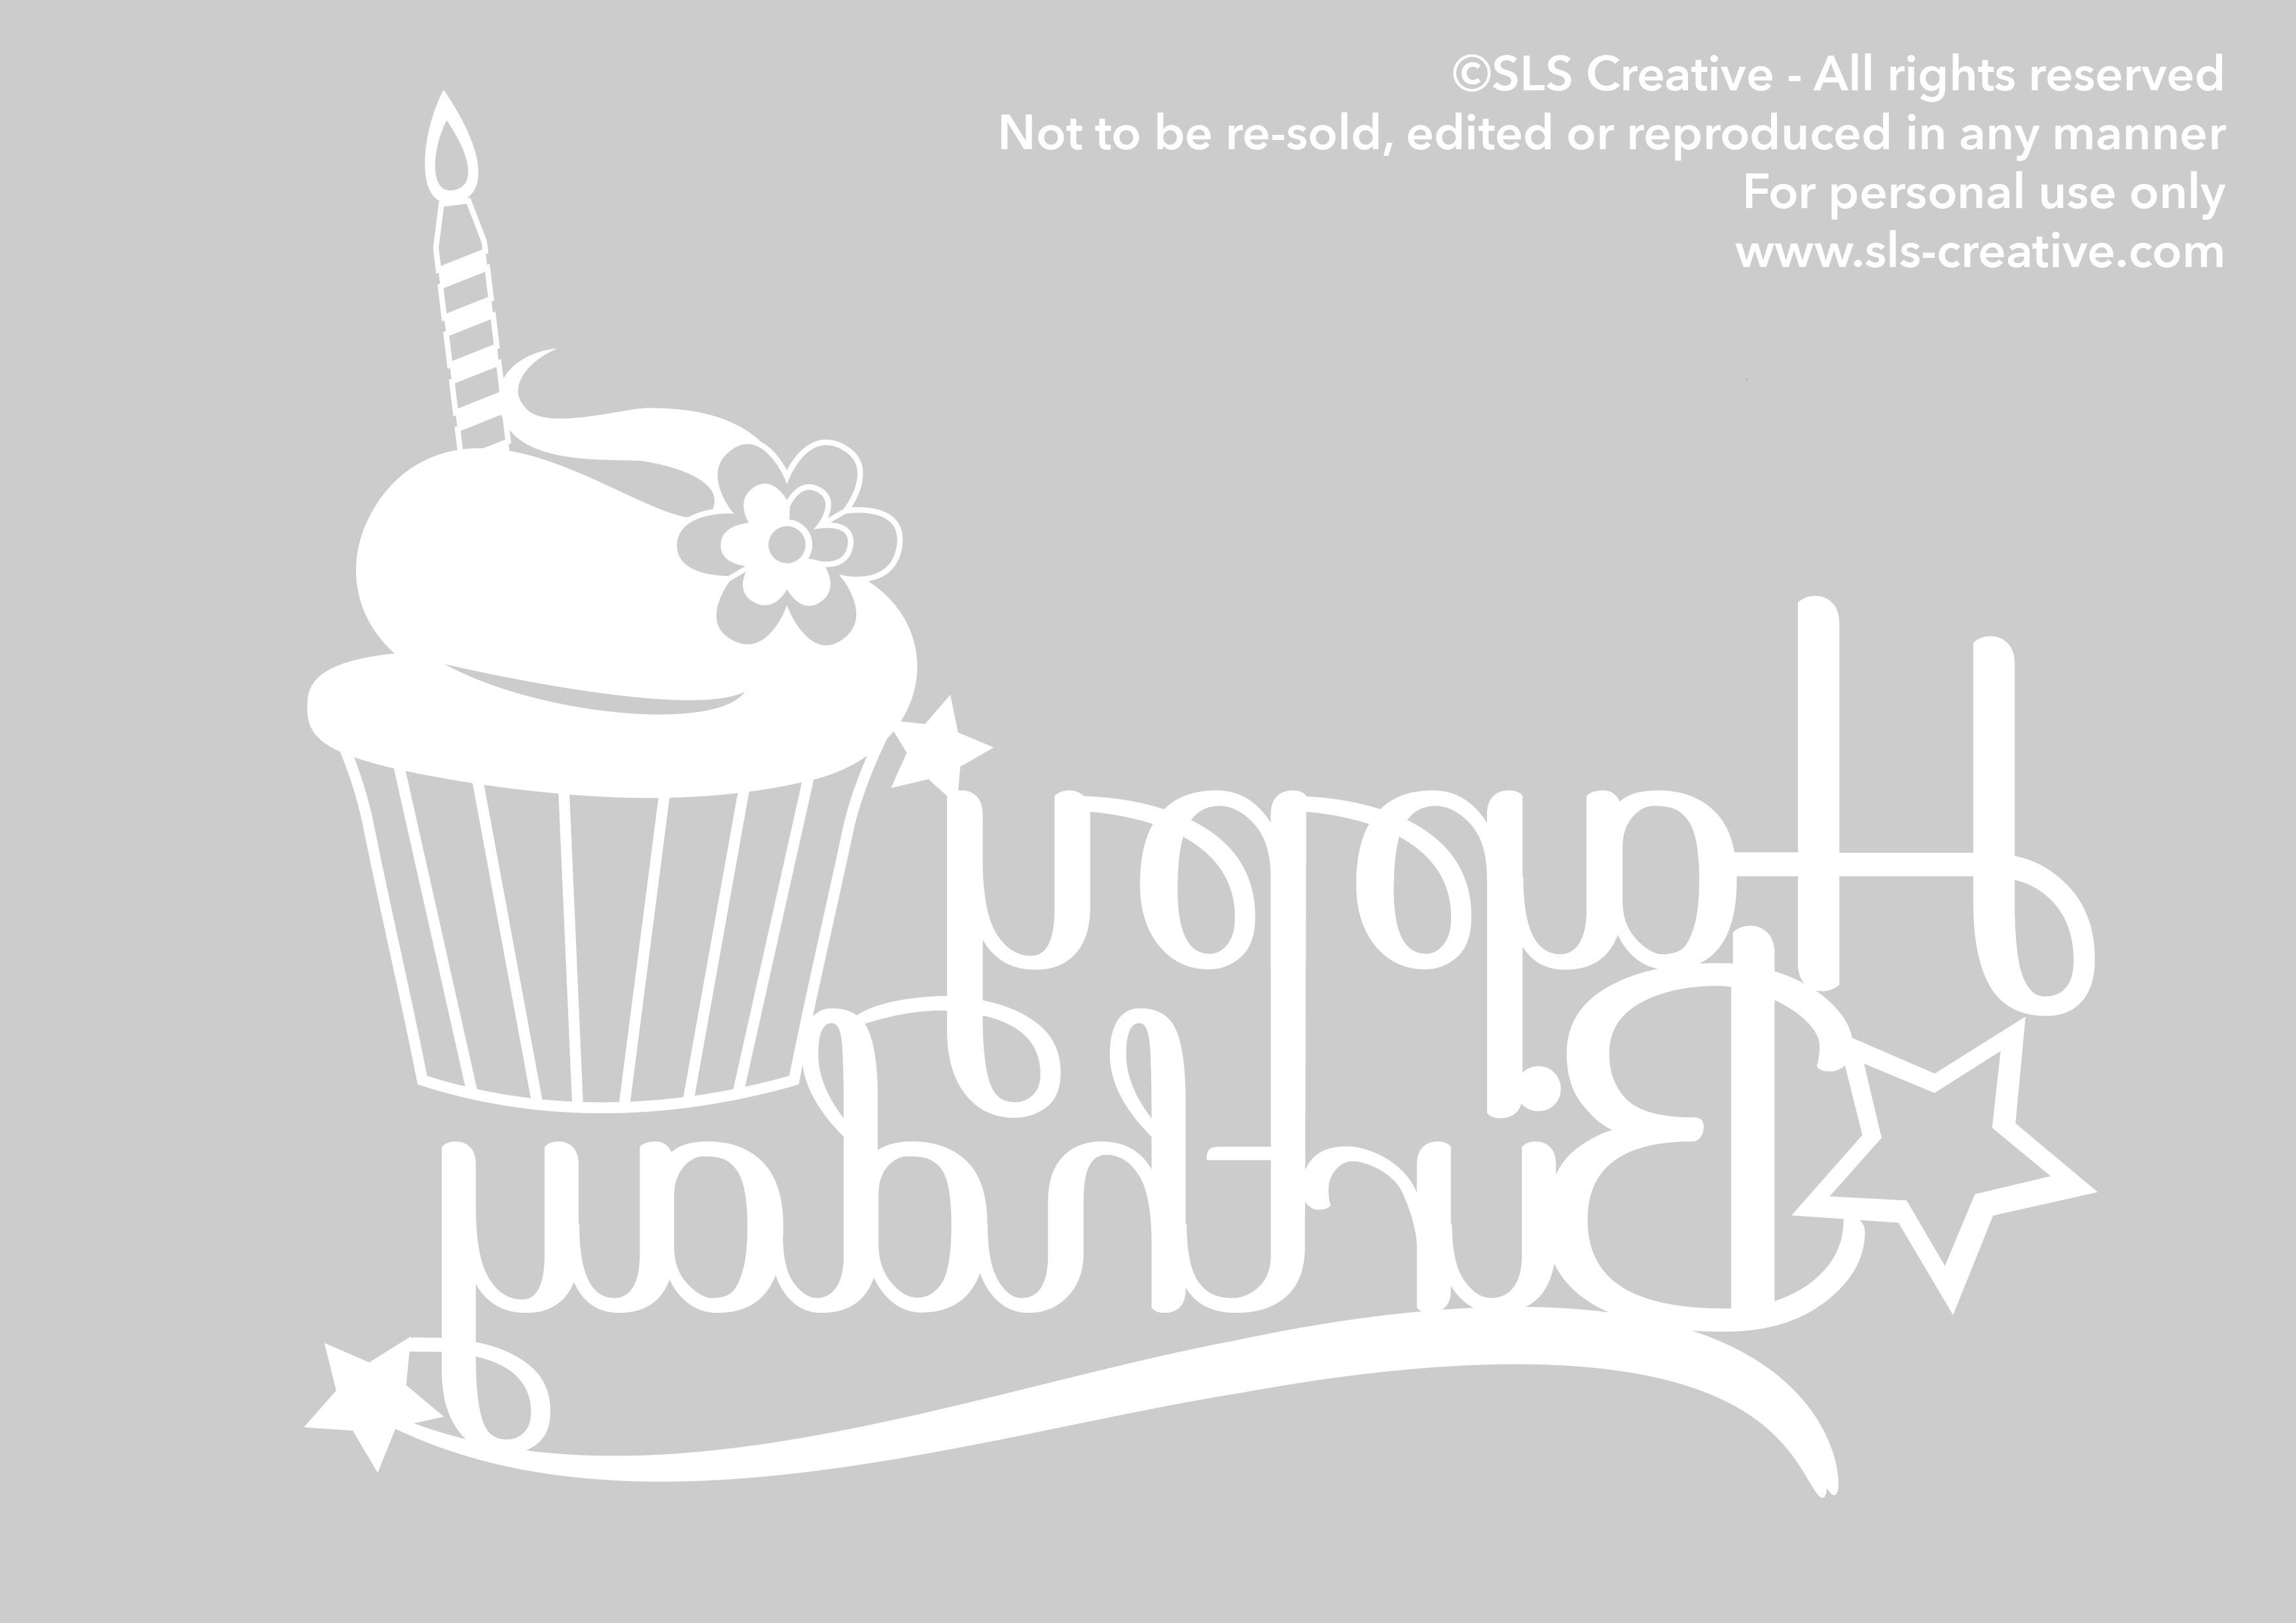 Happy Birthday SLS Creative! – Free Paper Cut Template | SLS Creative